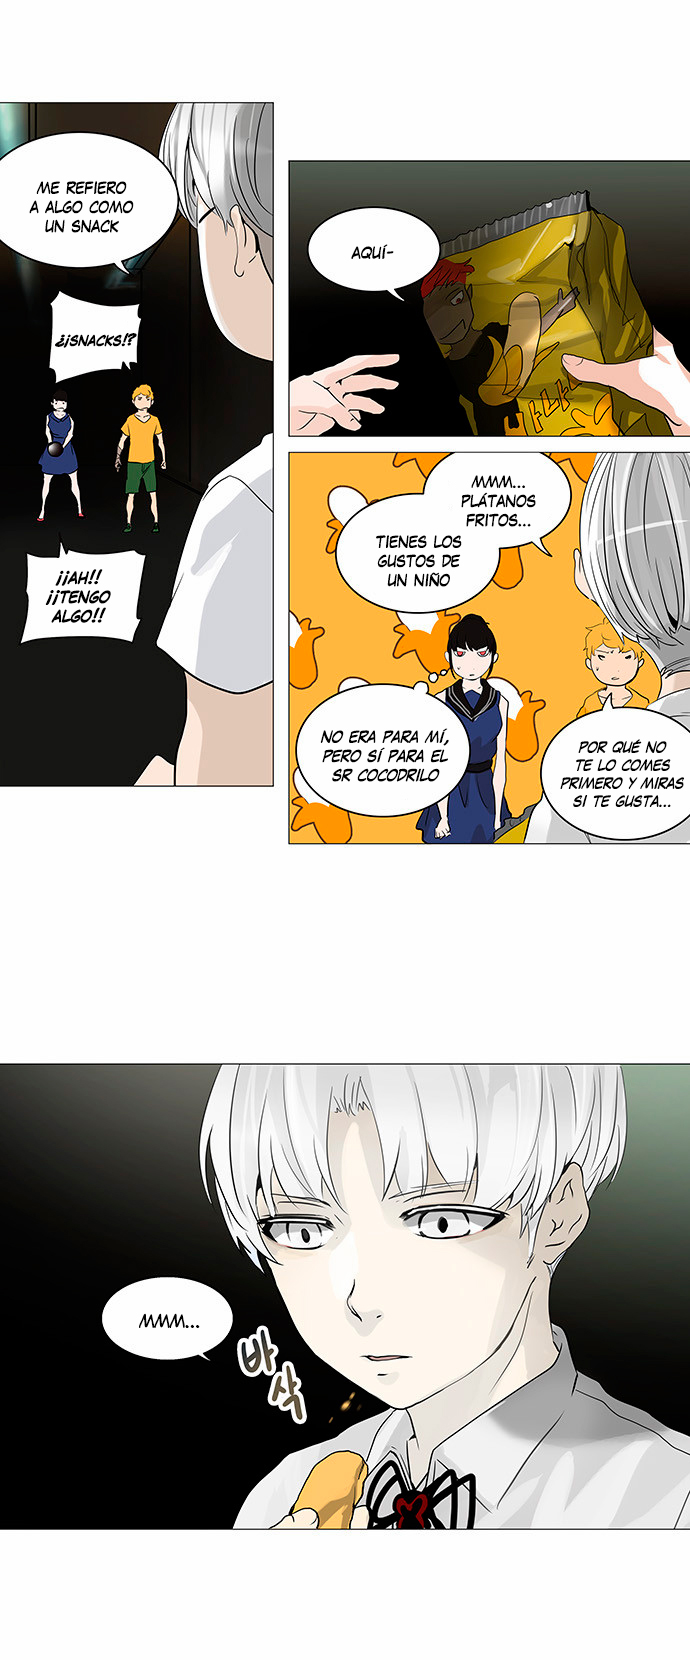 http://c5.ninemanga.com/es_manga/21/149/415447/30ed073085691825e4a8a078de862b80.jpg Page 5